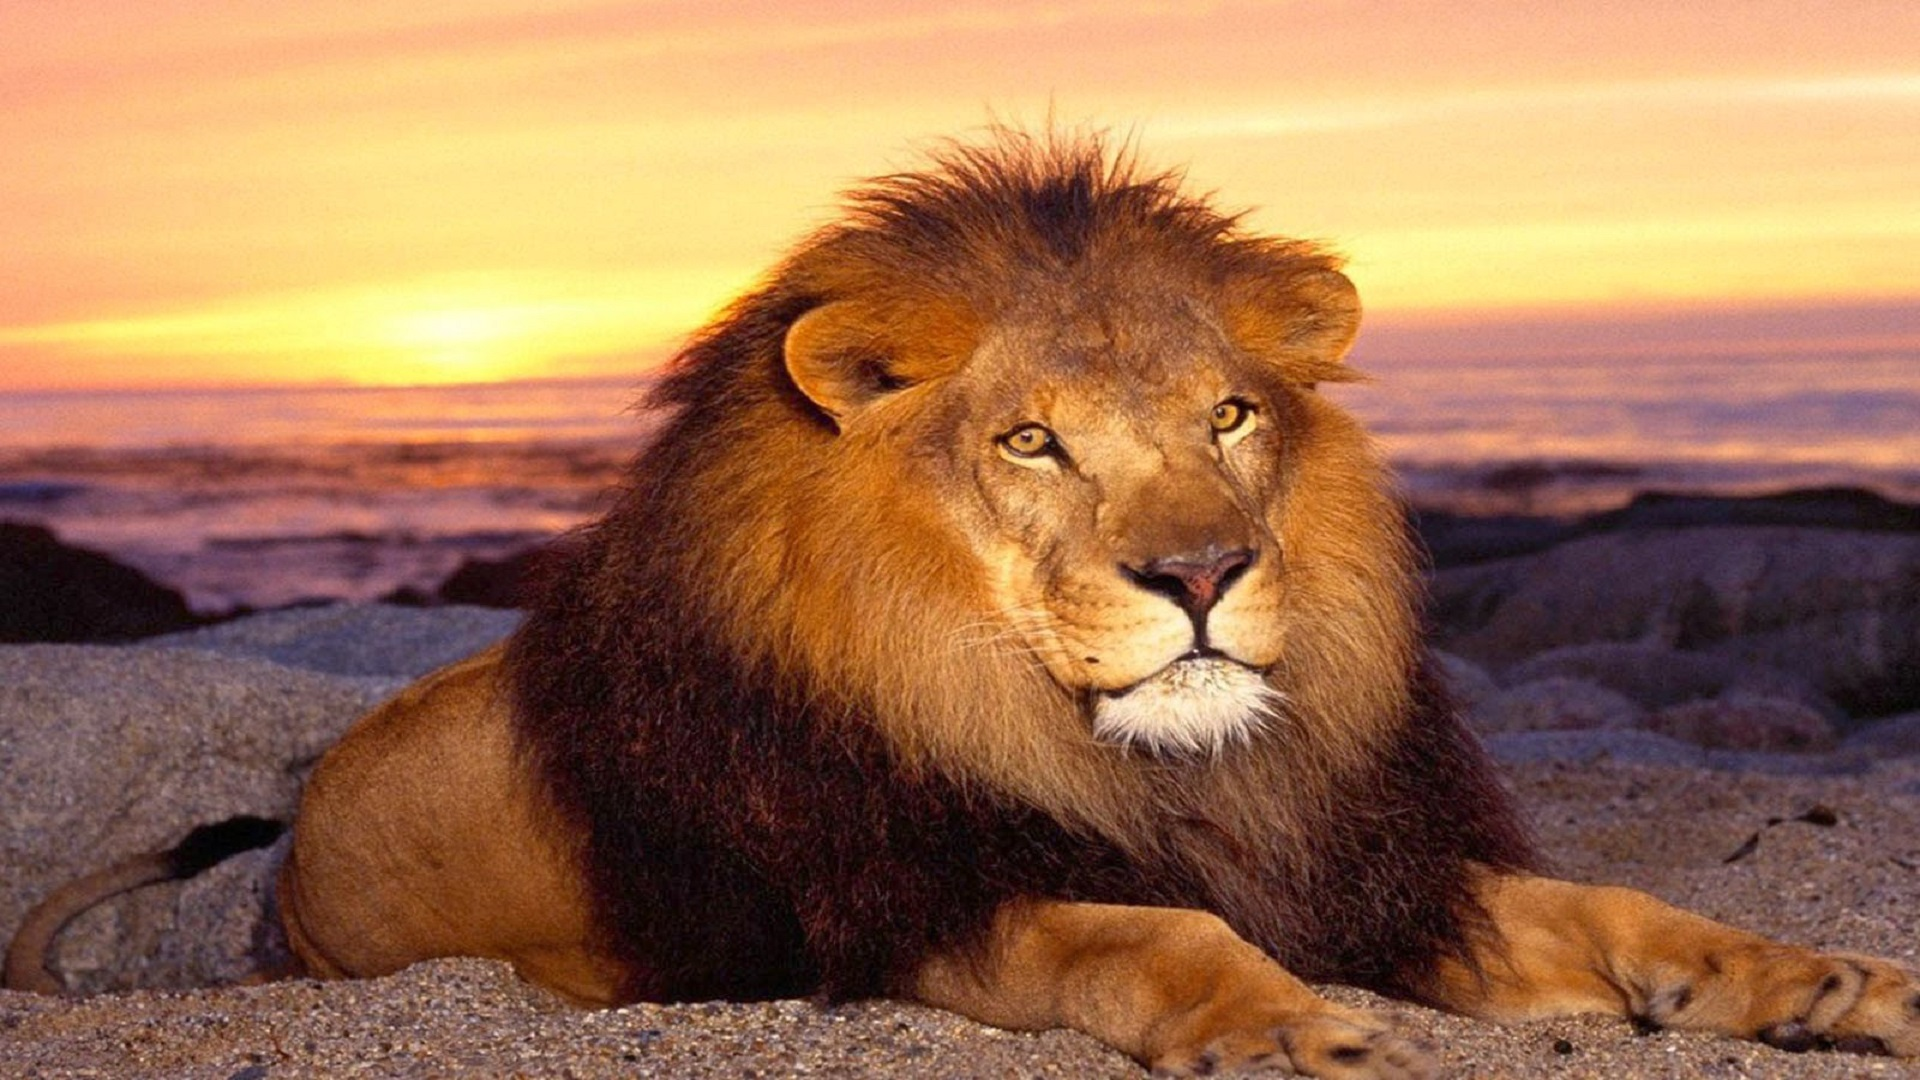 Most Dangrous African Lion Hd Free Wallpapers Hd Wallpaper